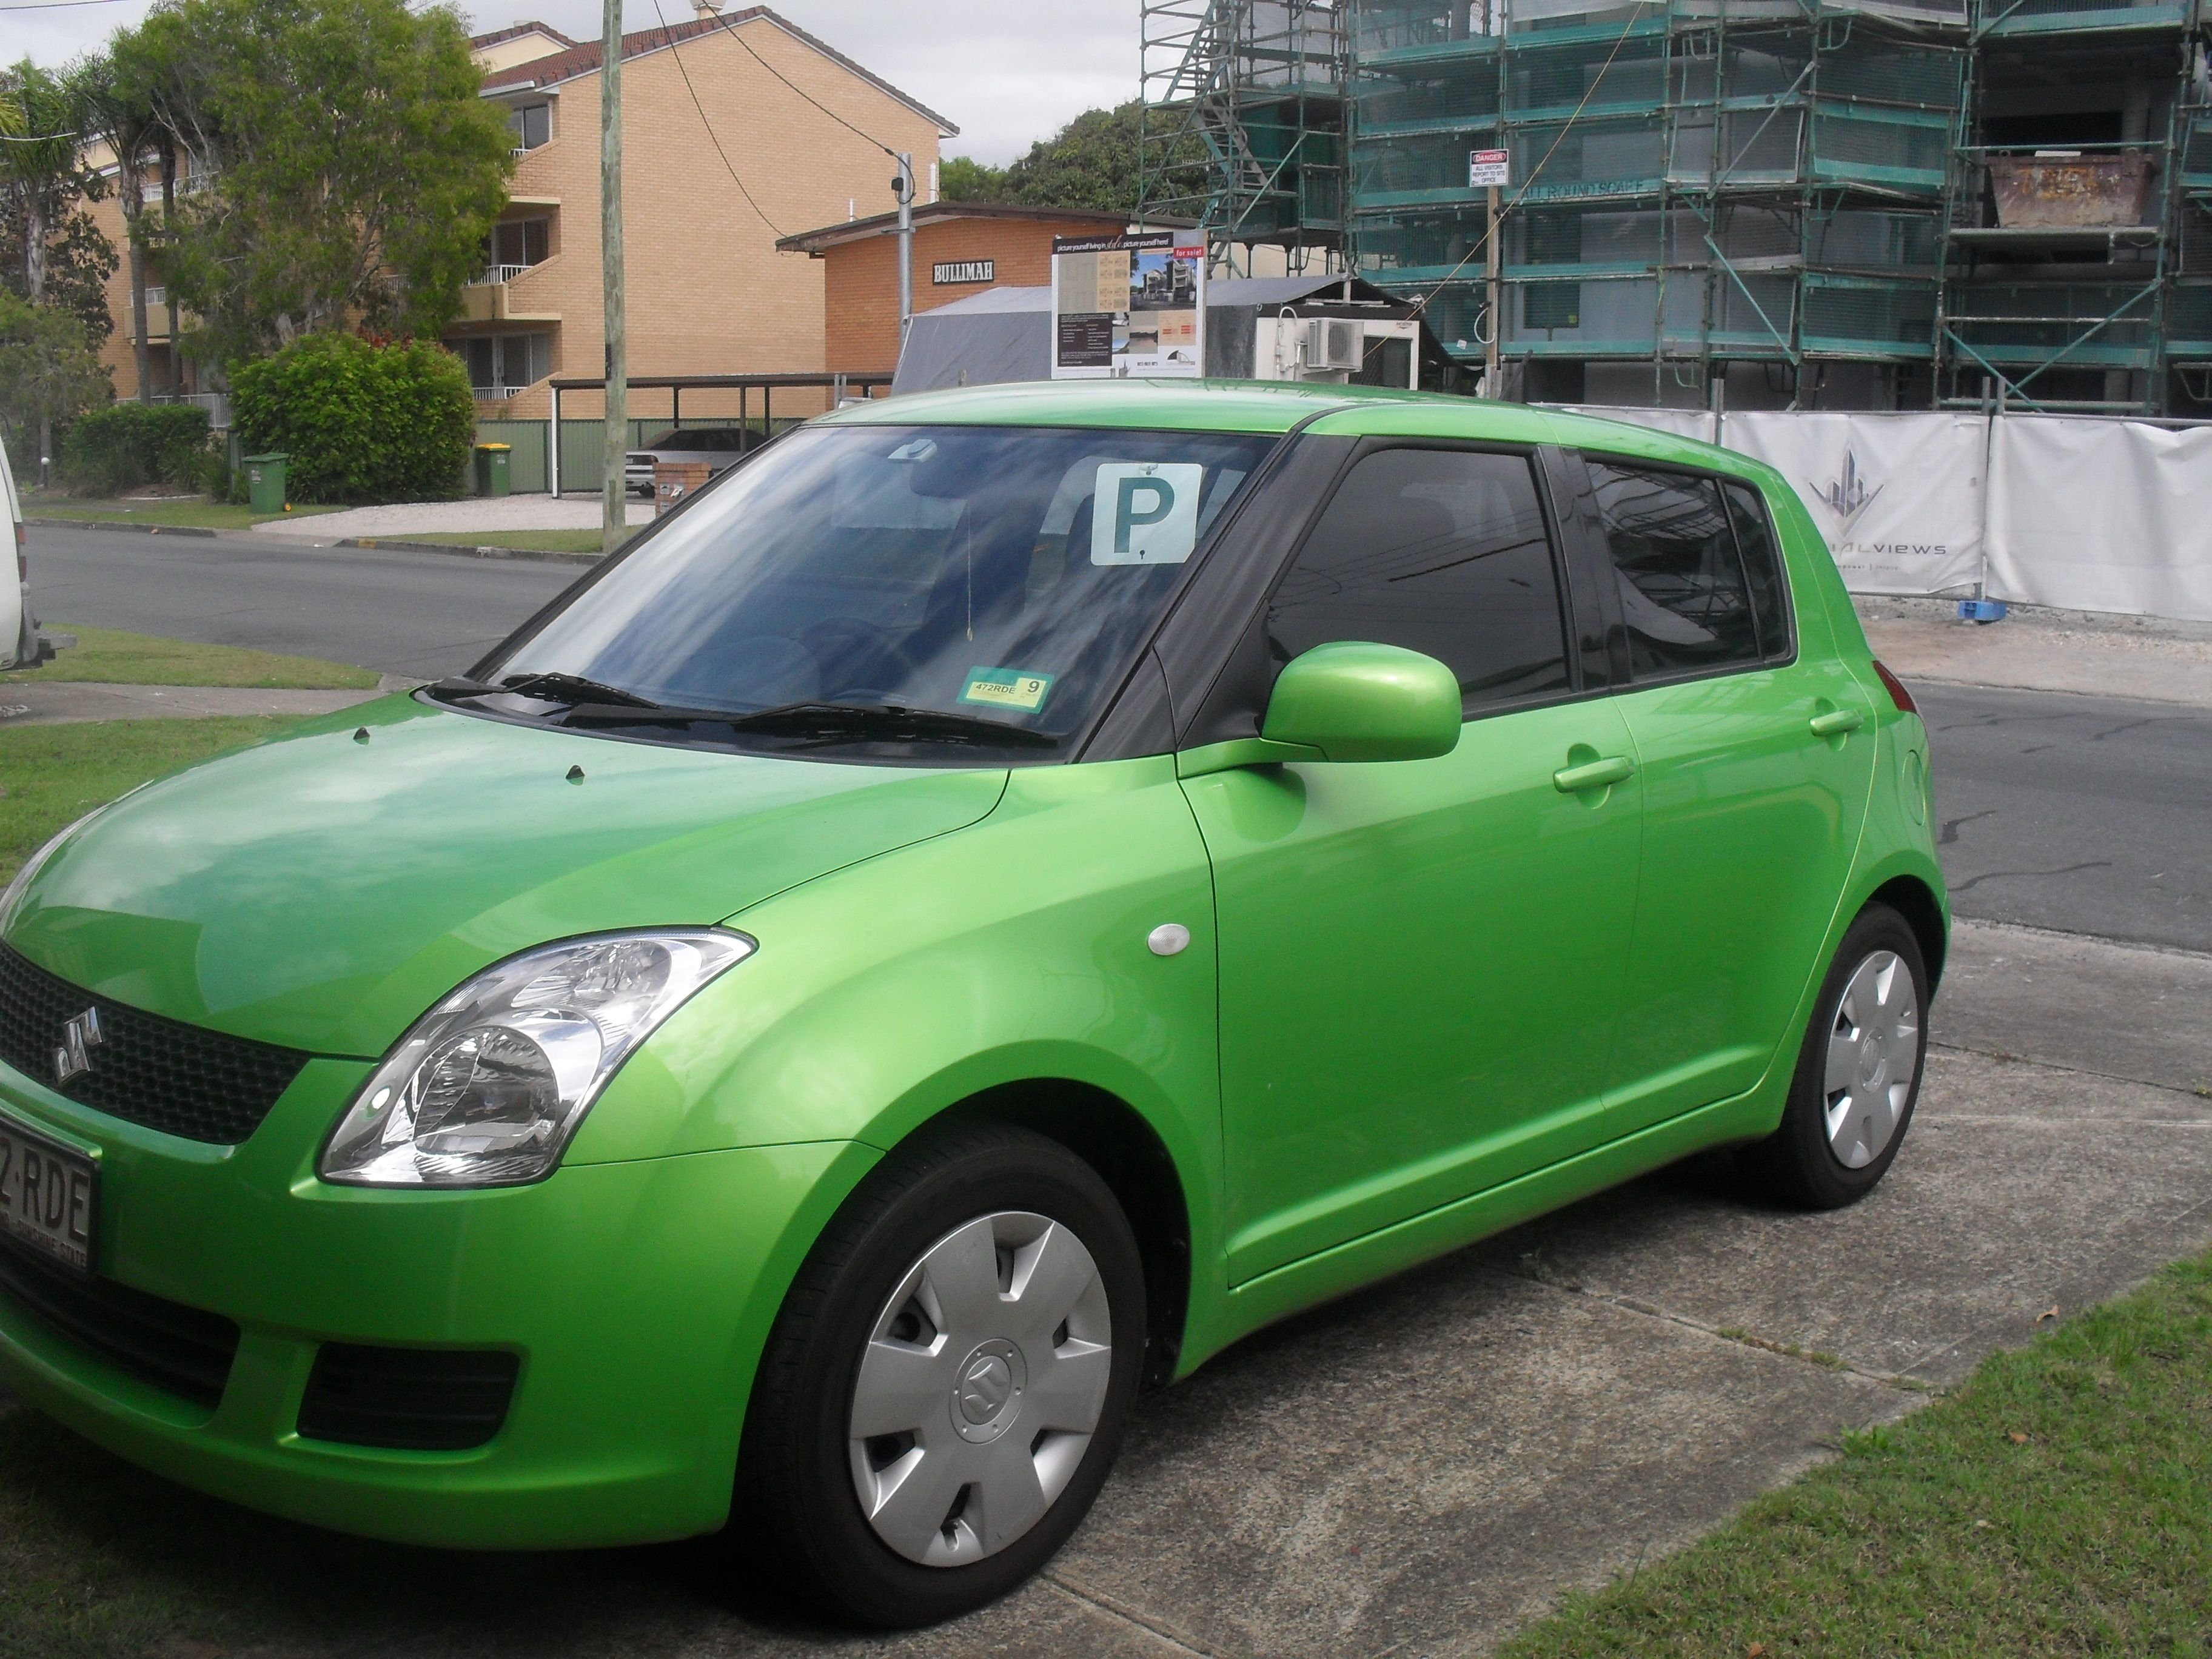 Suzuki Swift 3 Midori Green Suzuki Swift Suzuki Green